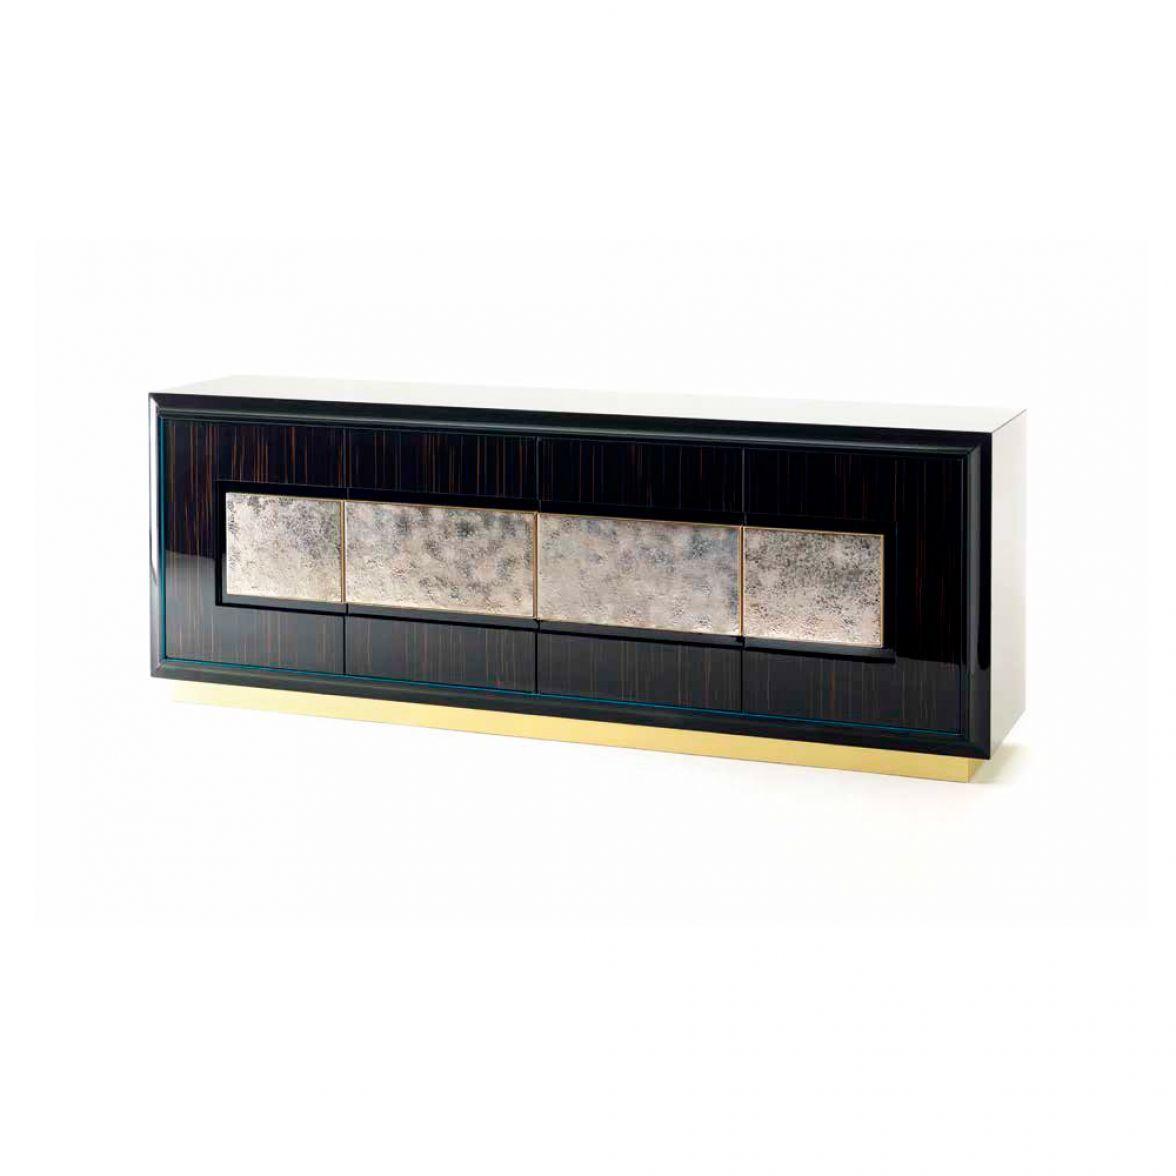 Herbert sideboard